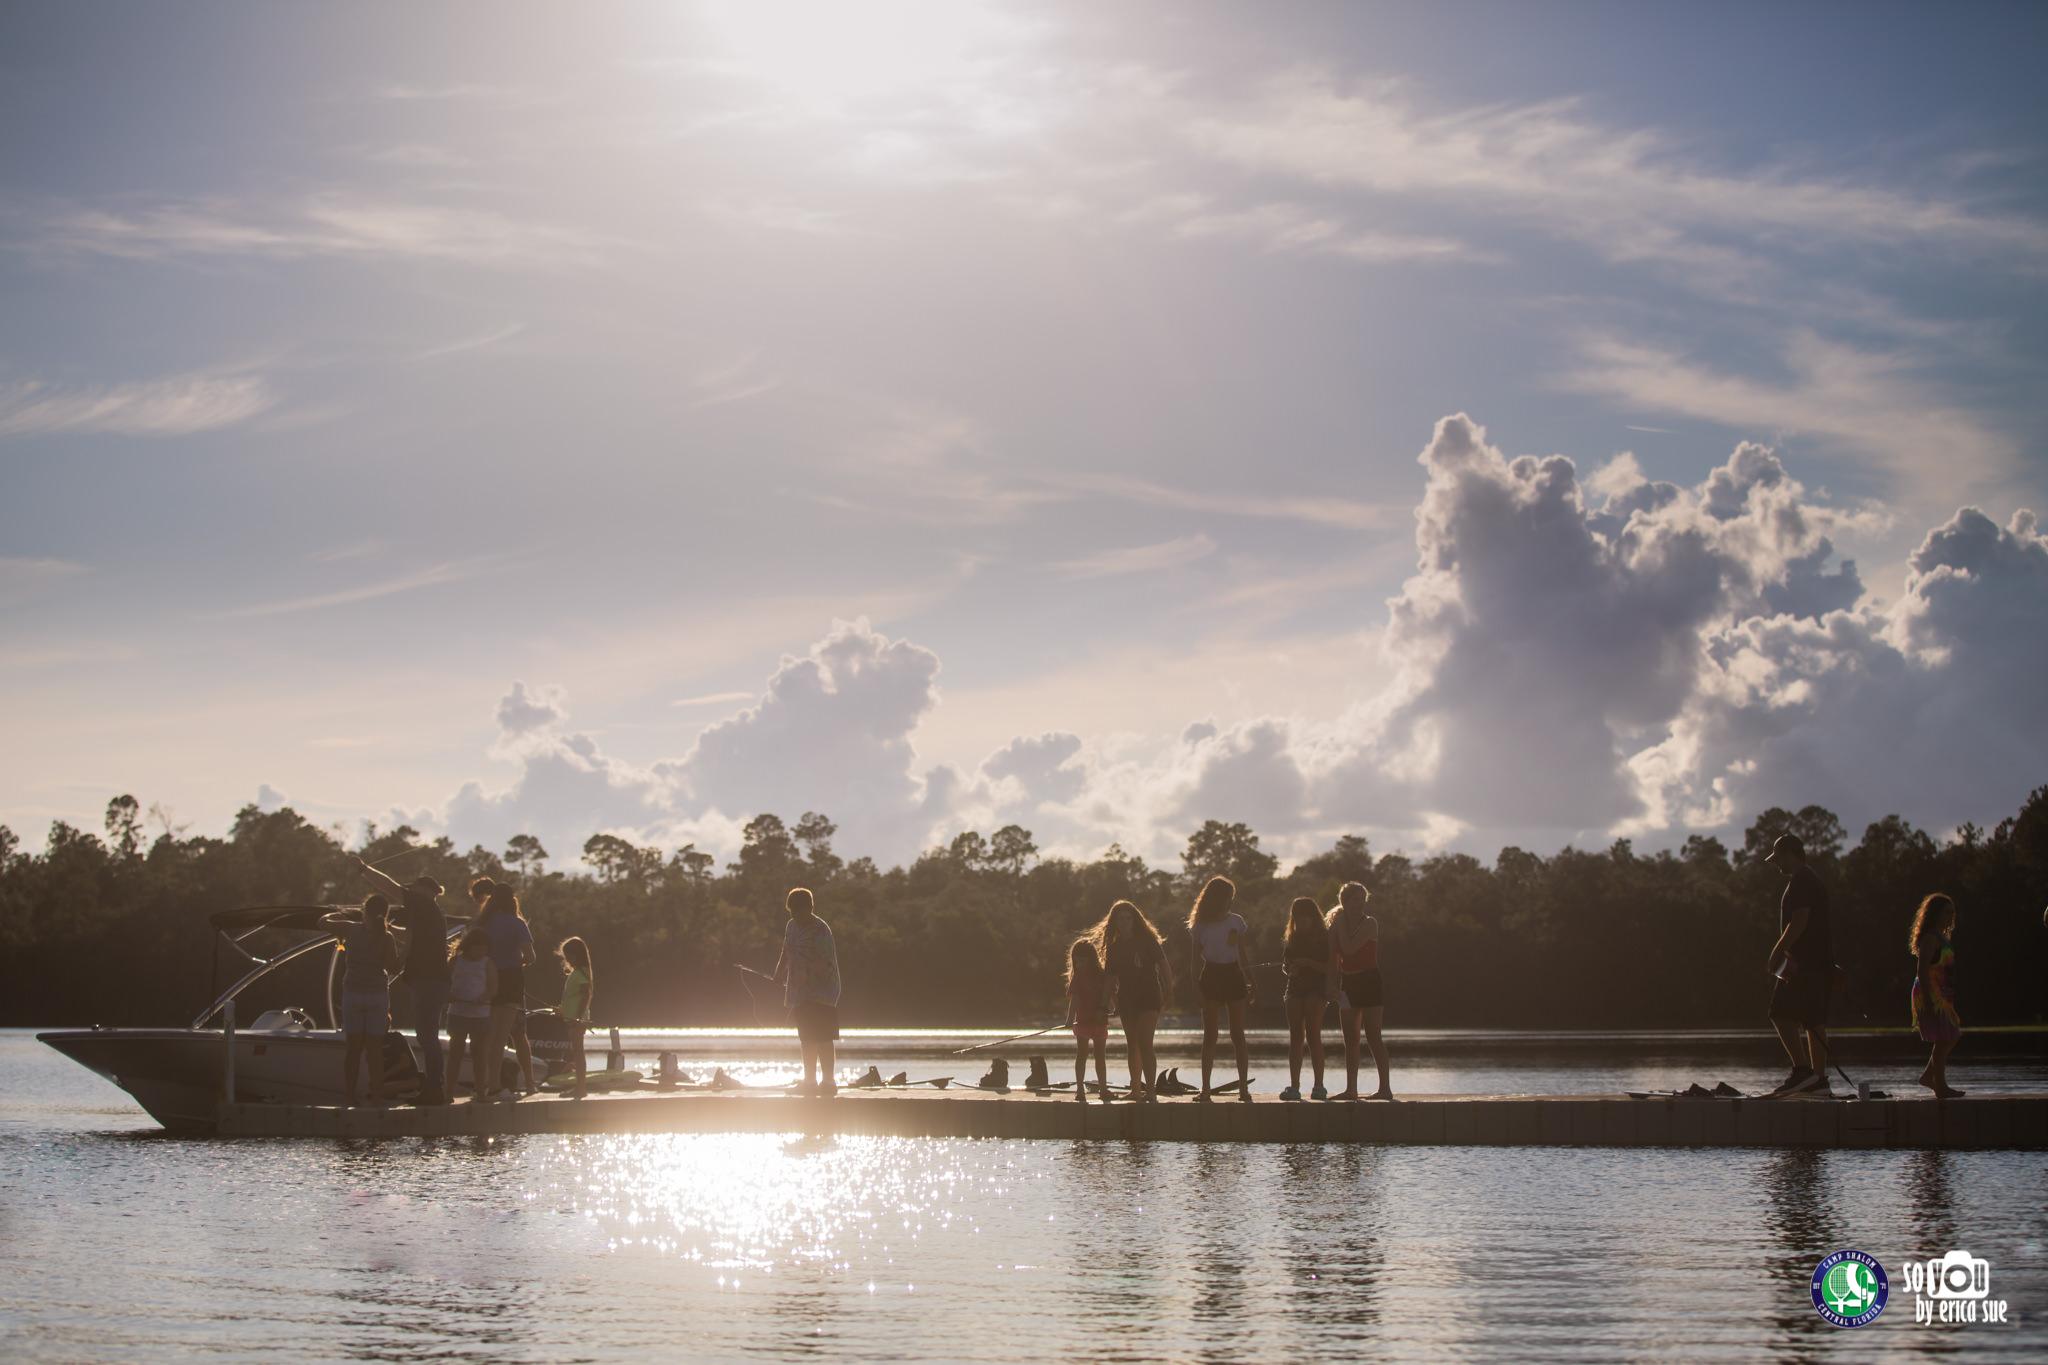 so-you-by-erica-sue-camp-shalom-central-florida-sleepaway-camp-4420.jpg